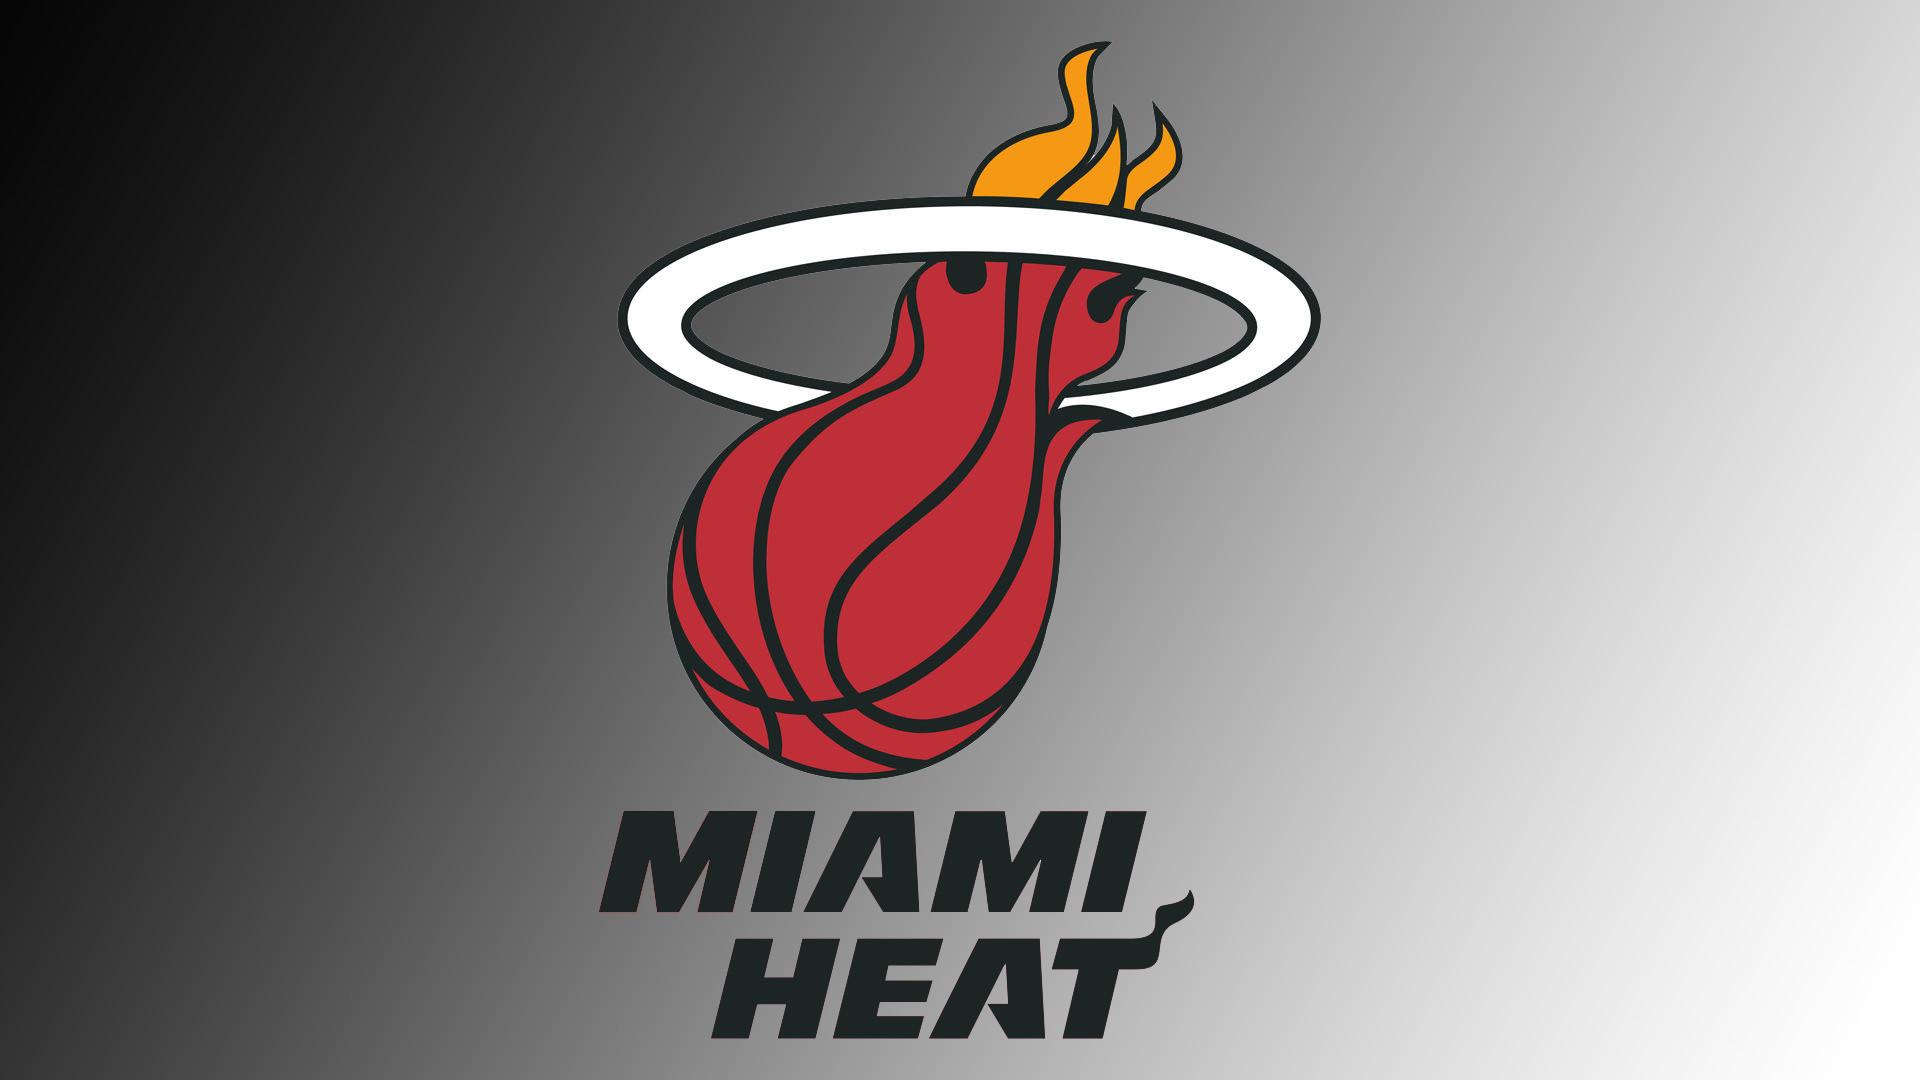 Miami Heat Logo Wallpaper HD 21 hd background hd screensavers hd .